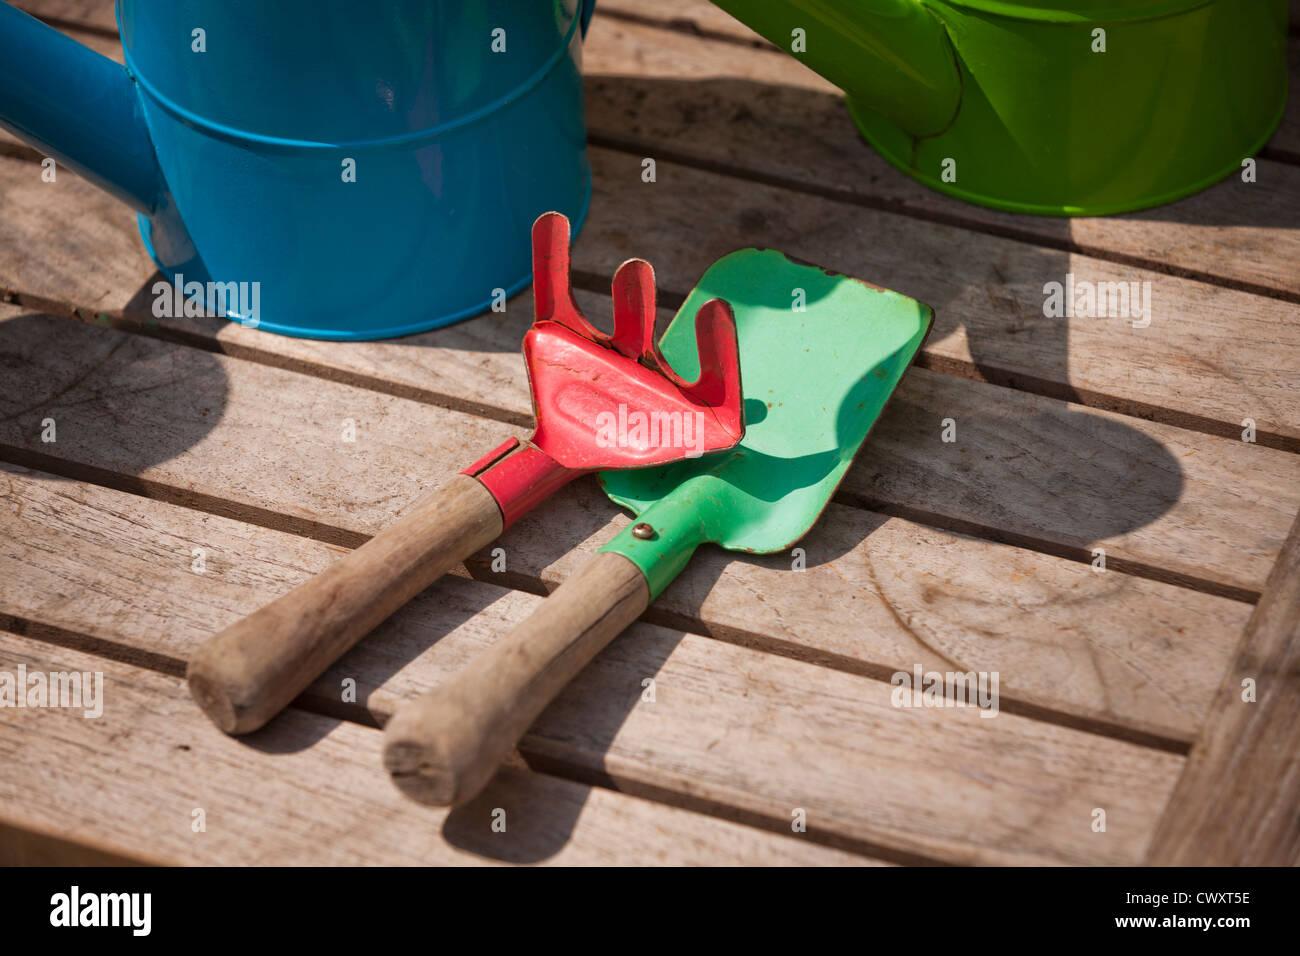 Colorful children's hand rake and shovel set - Stock Image